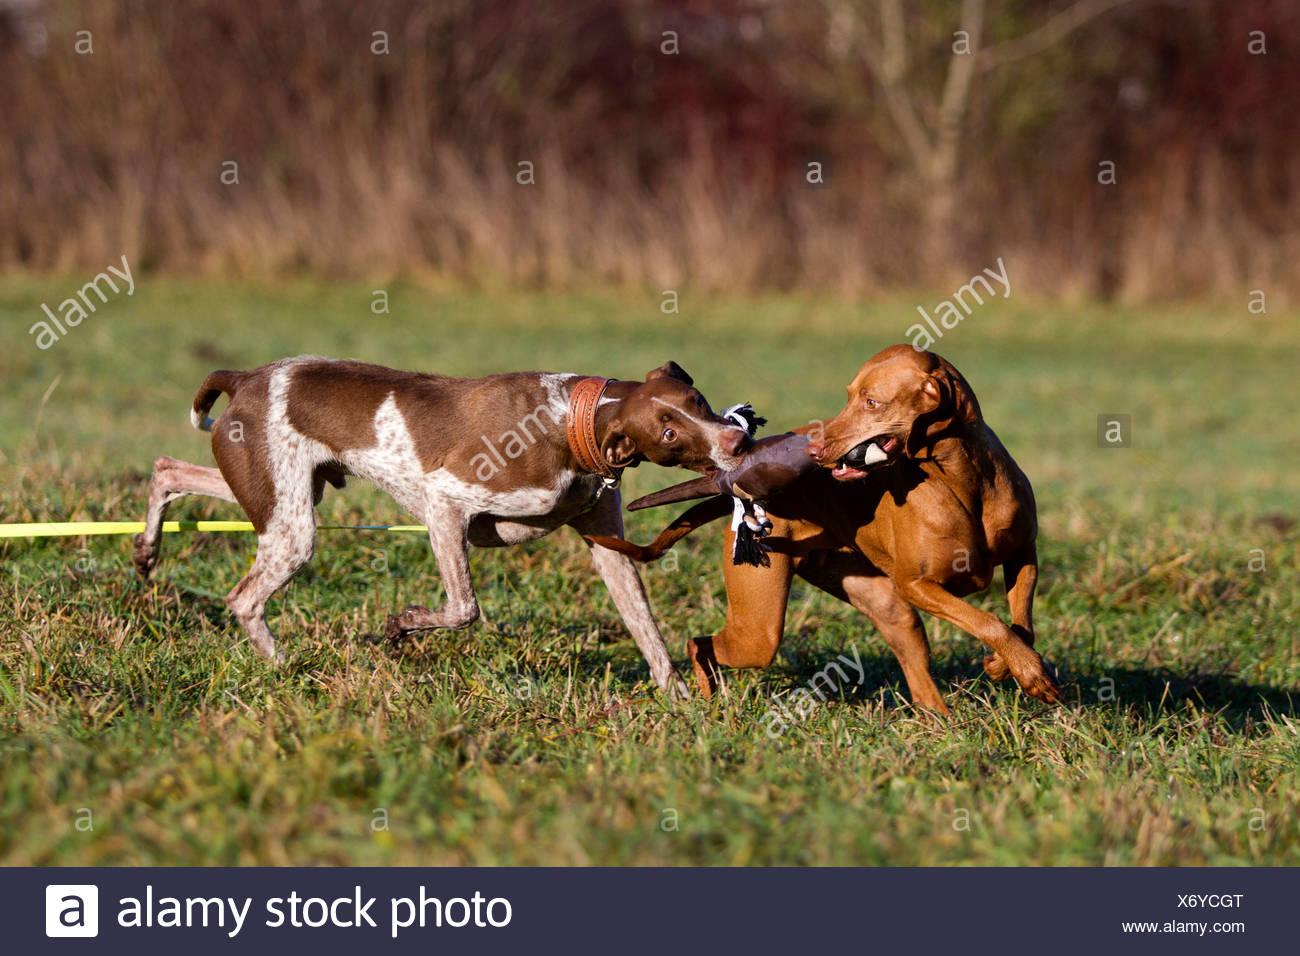 Breed dog fighting